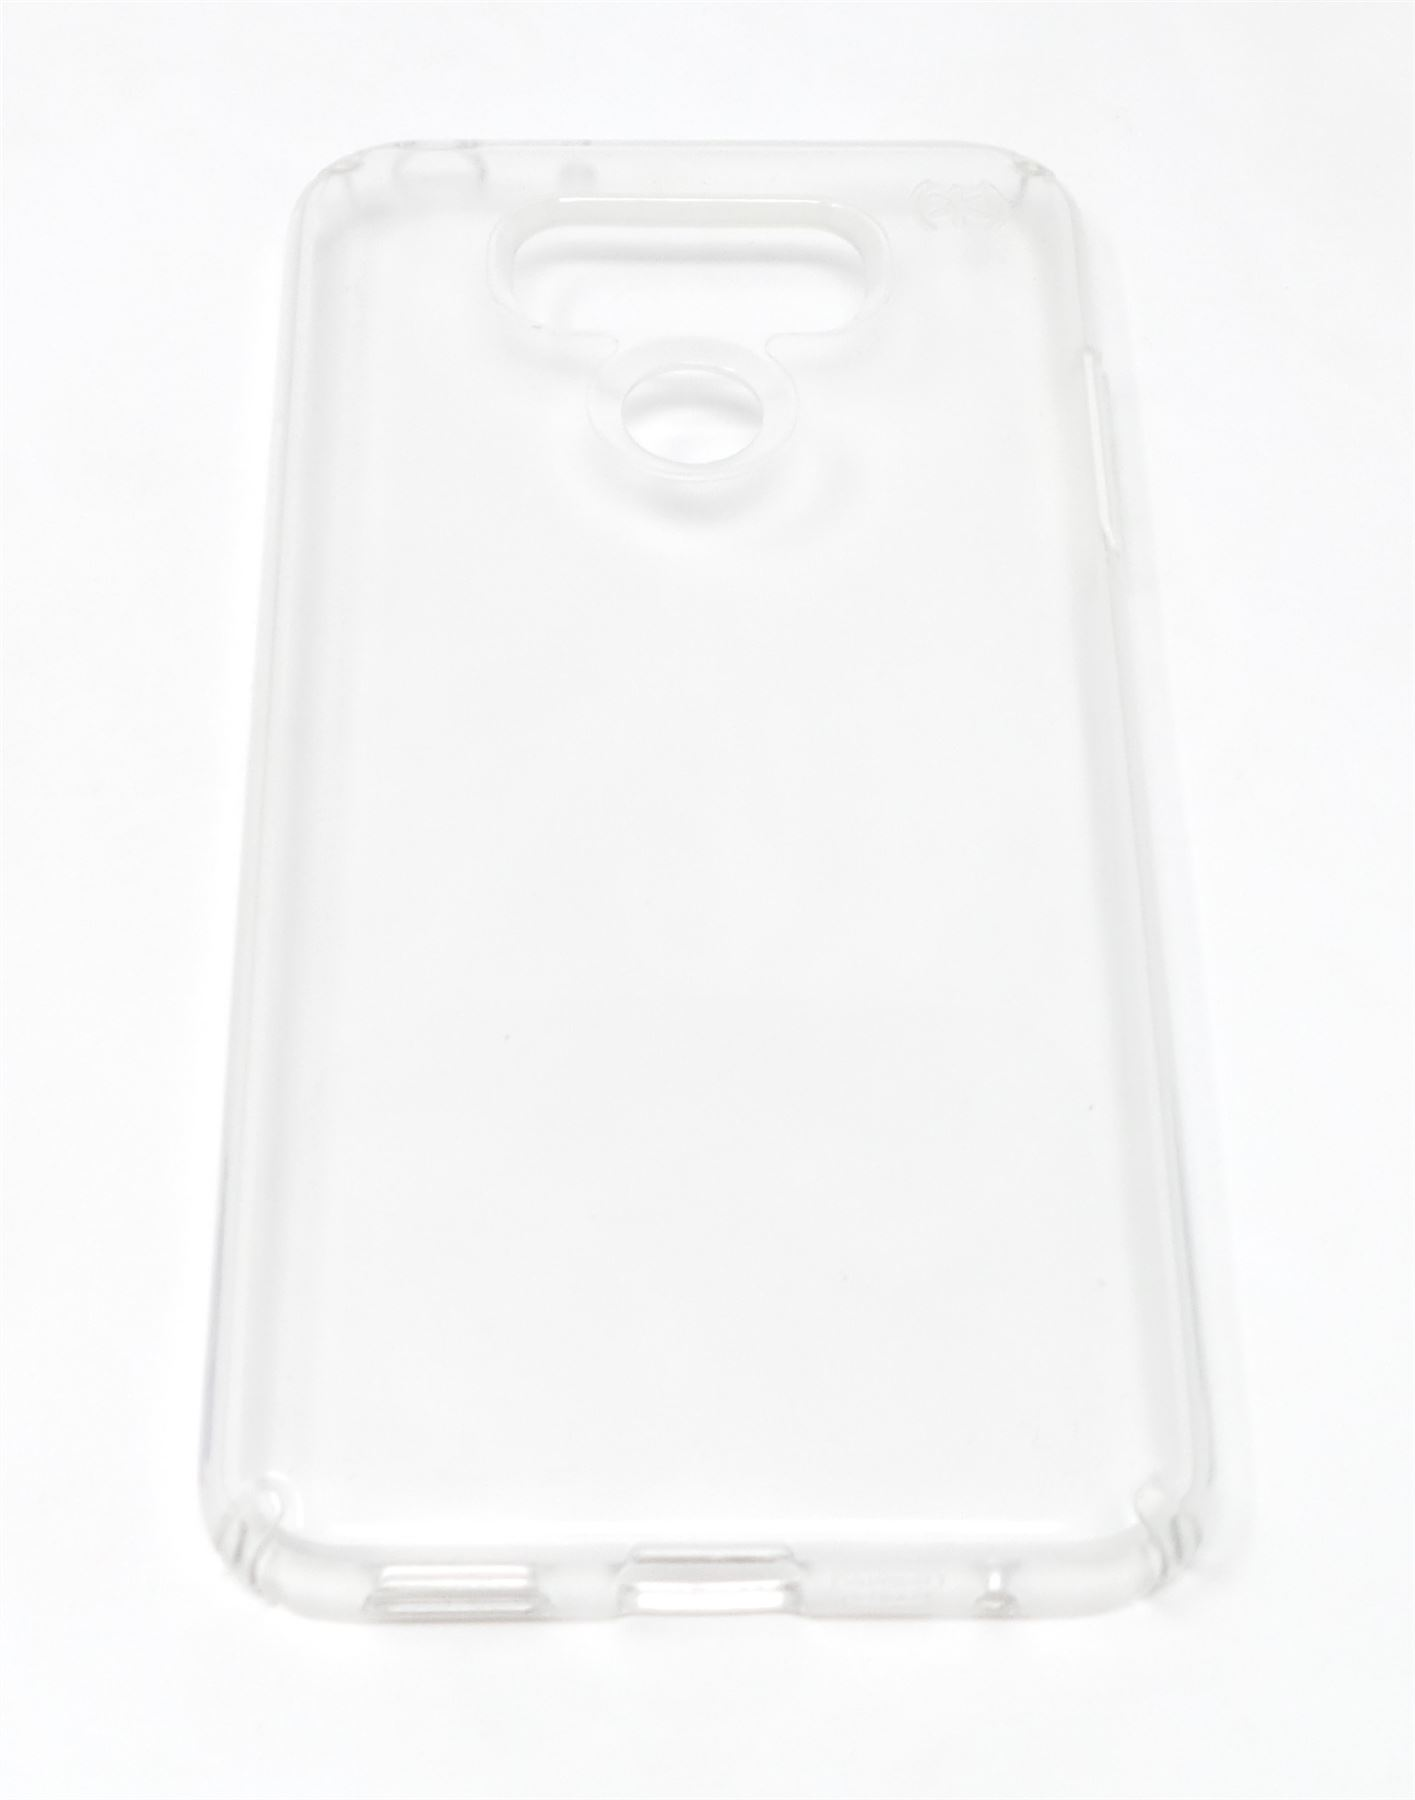 Speck Presidio Slim Clear Case Cover For Lg G6